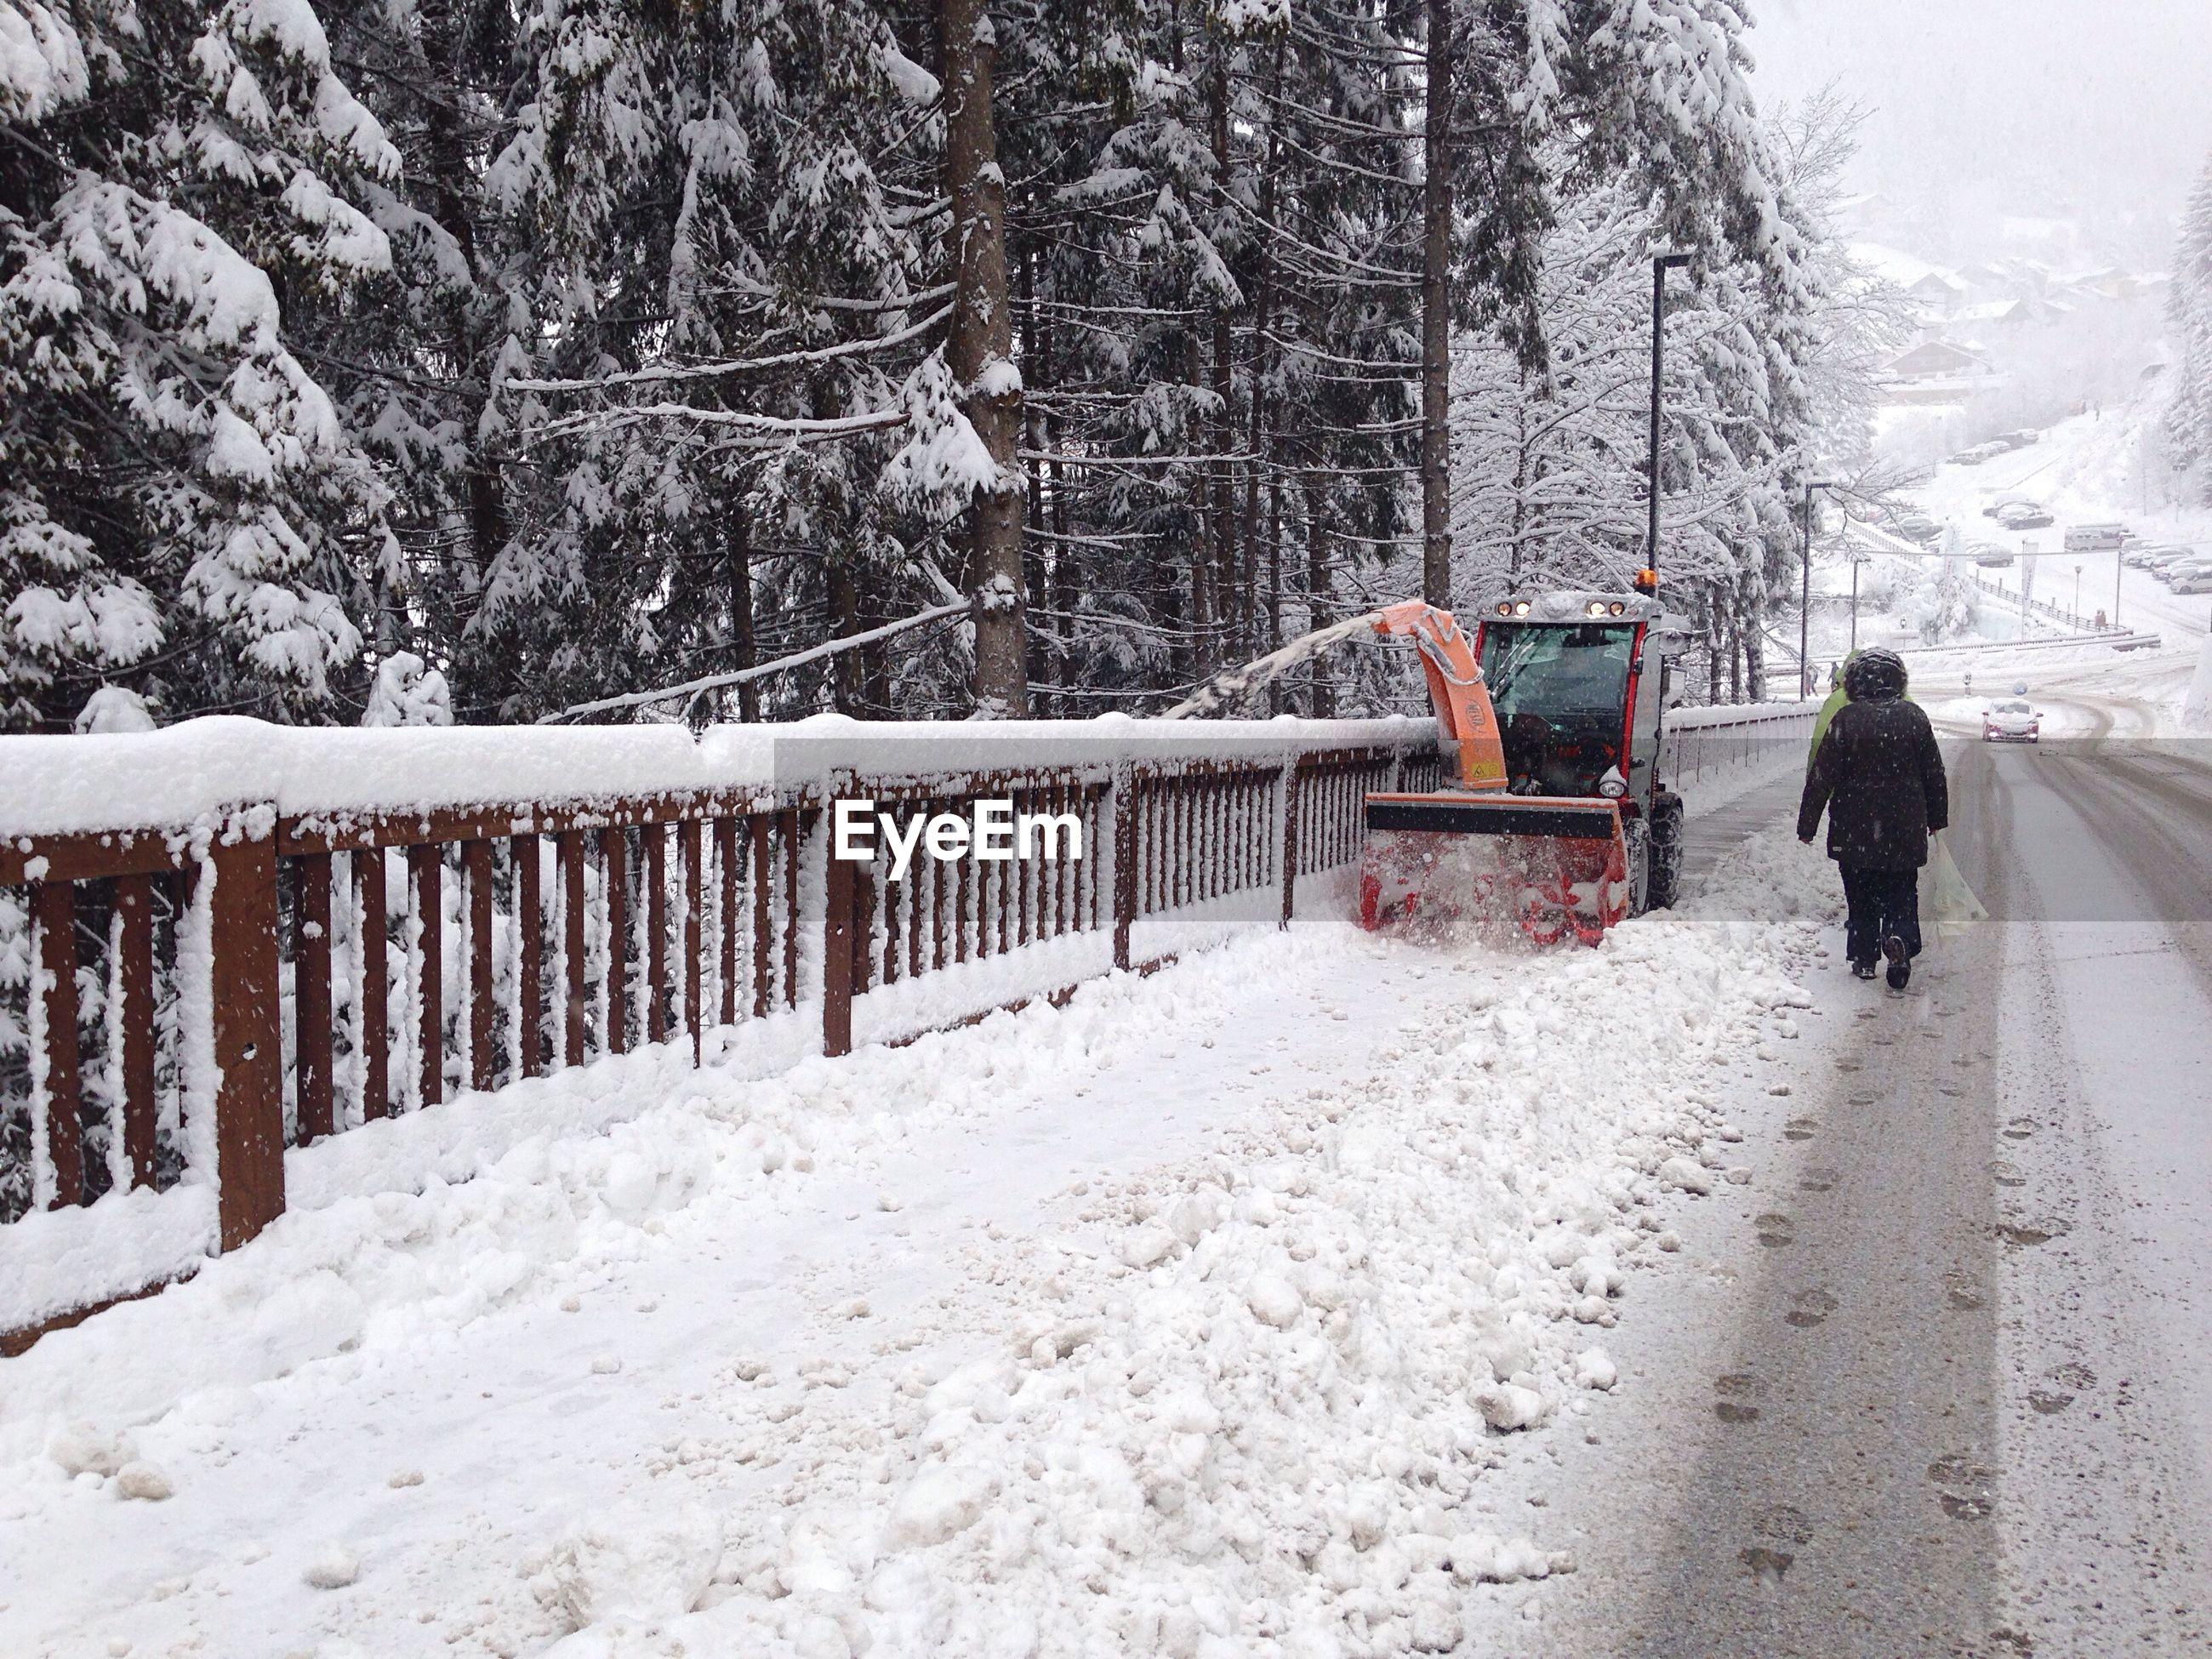 Snowplow by street during winter